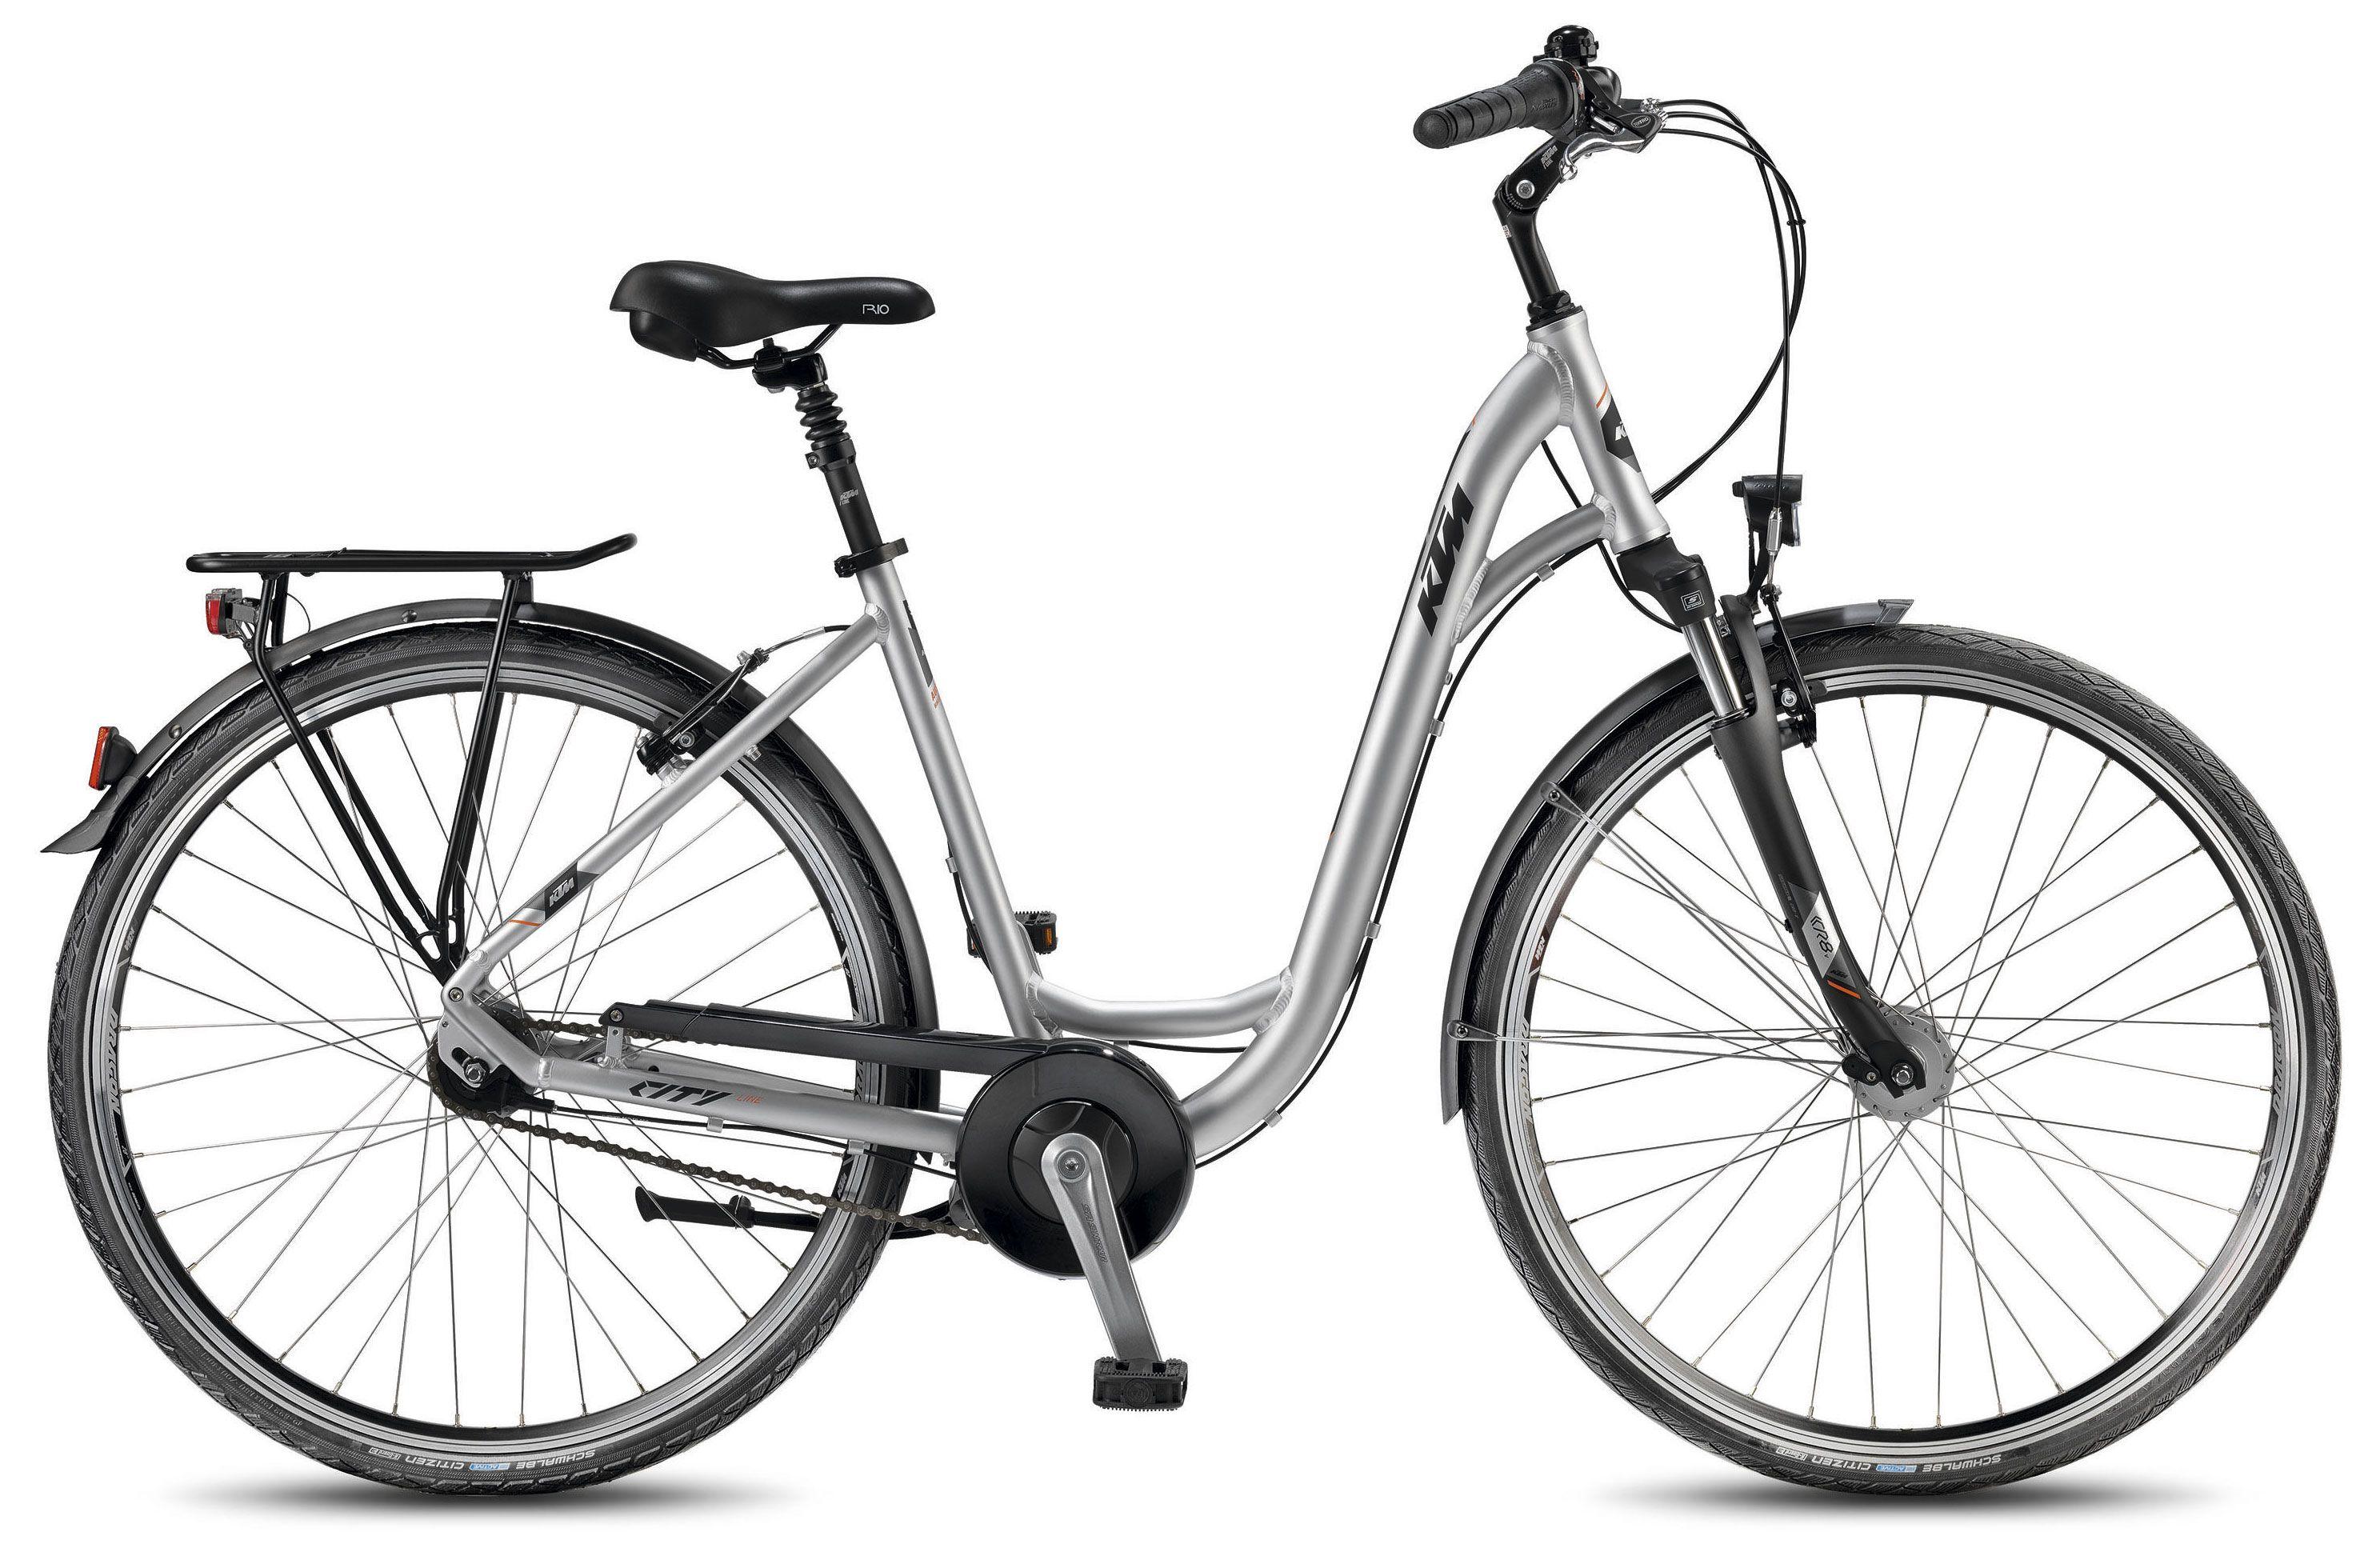 Велосипед KTM City Line 28.7 DA-W 2018 велосипед ktm canic cxa 2018